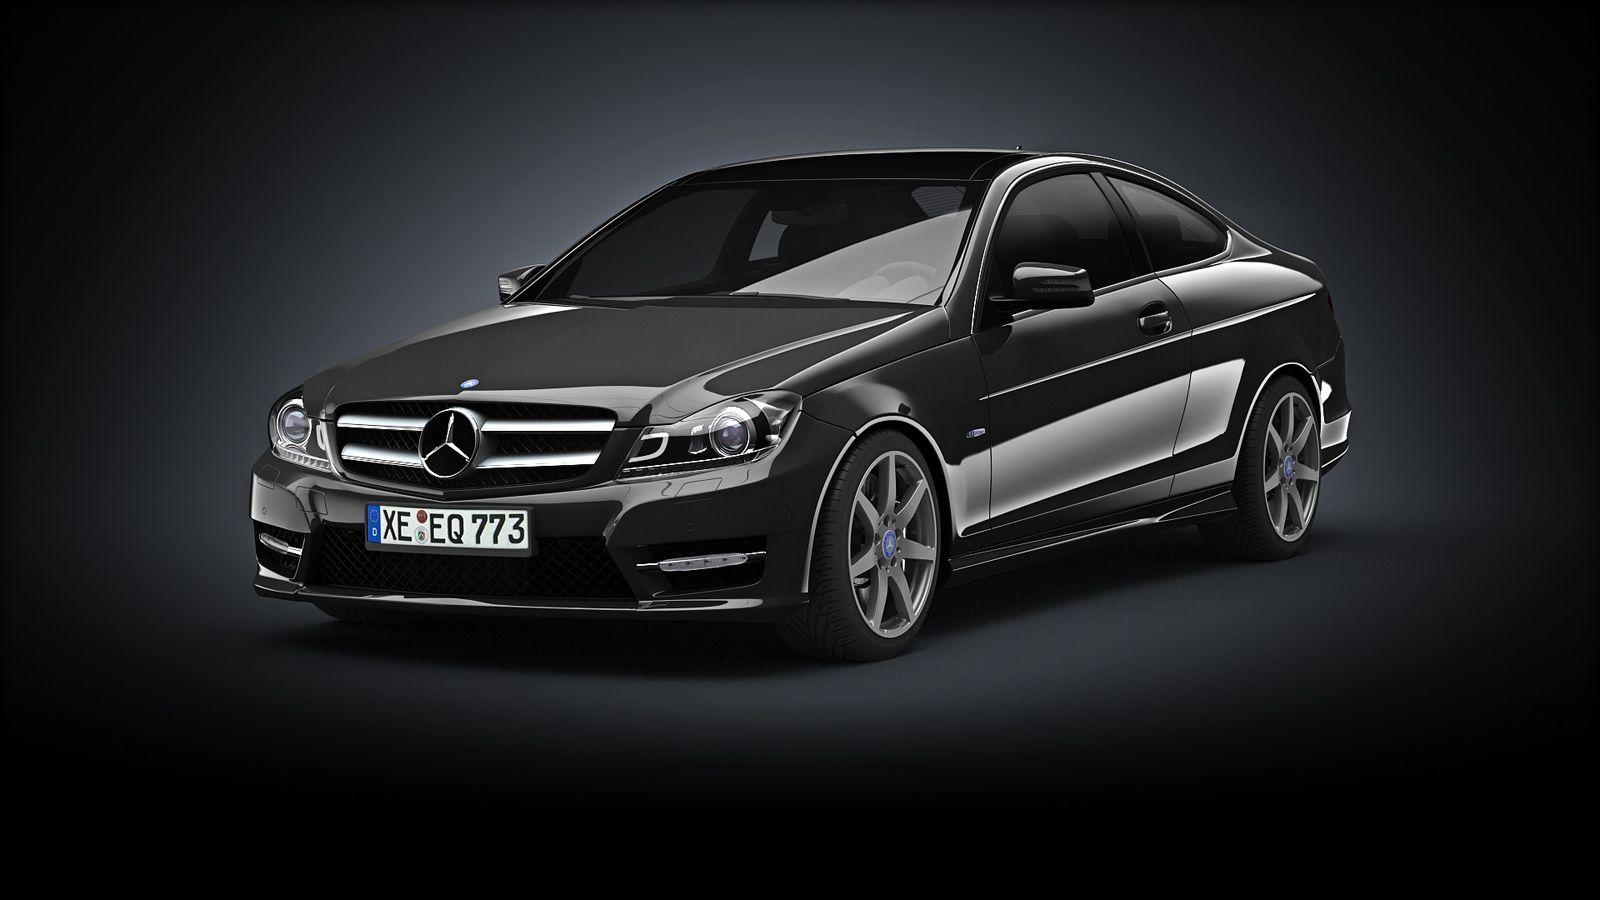 Mercedes C Class Coupe 2012 By Yavuzbattal Mercedes C Class